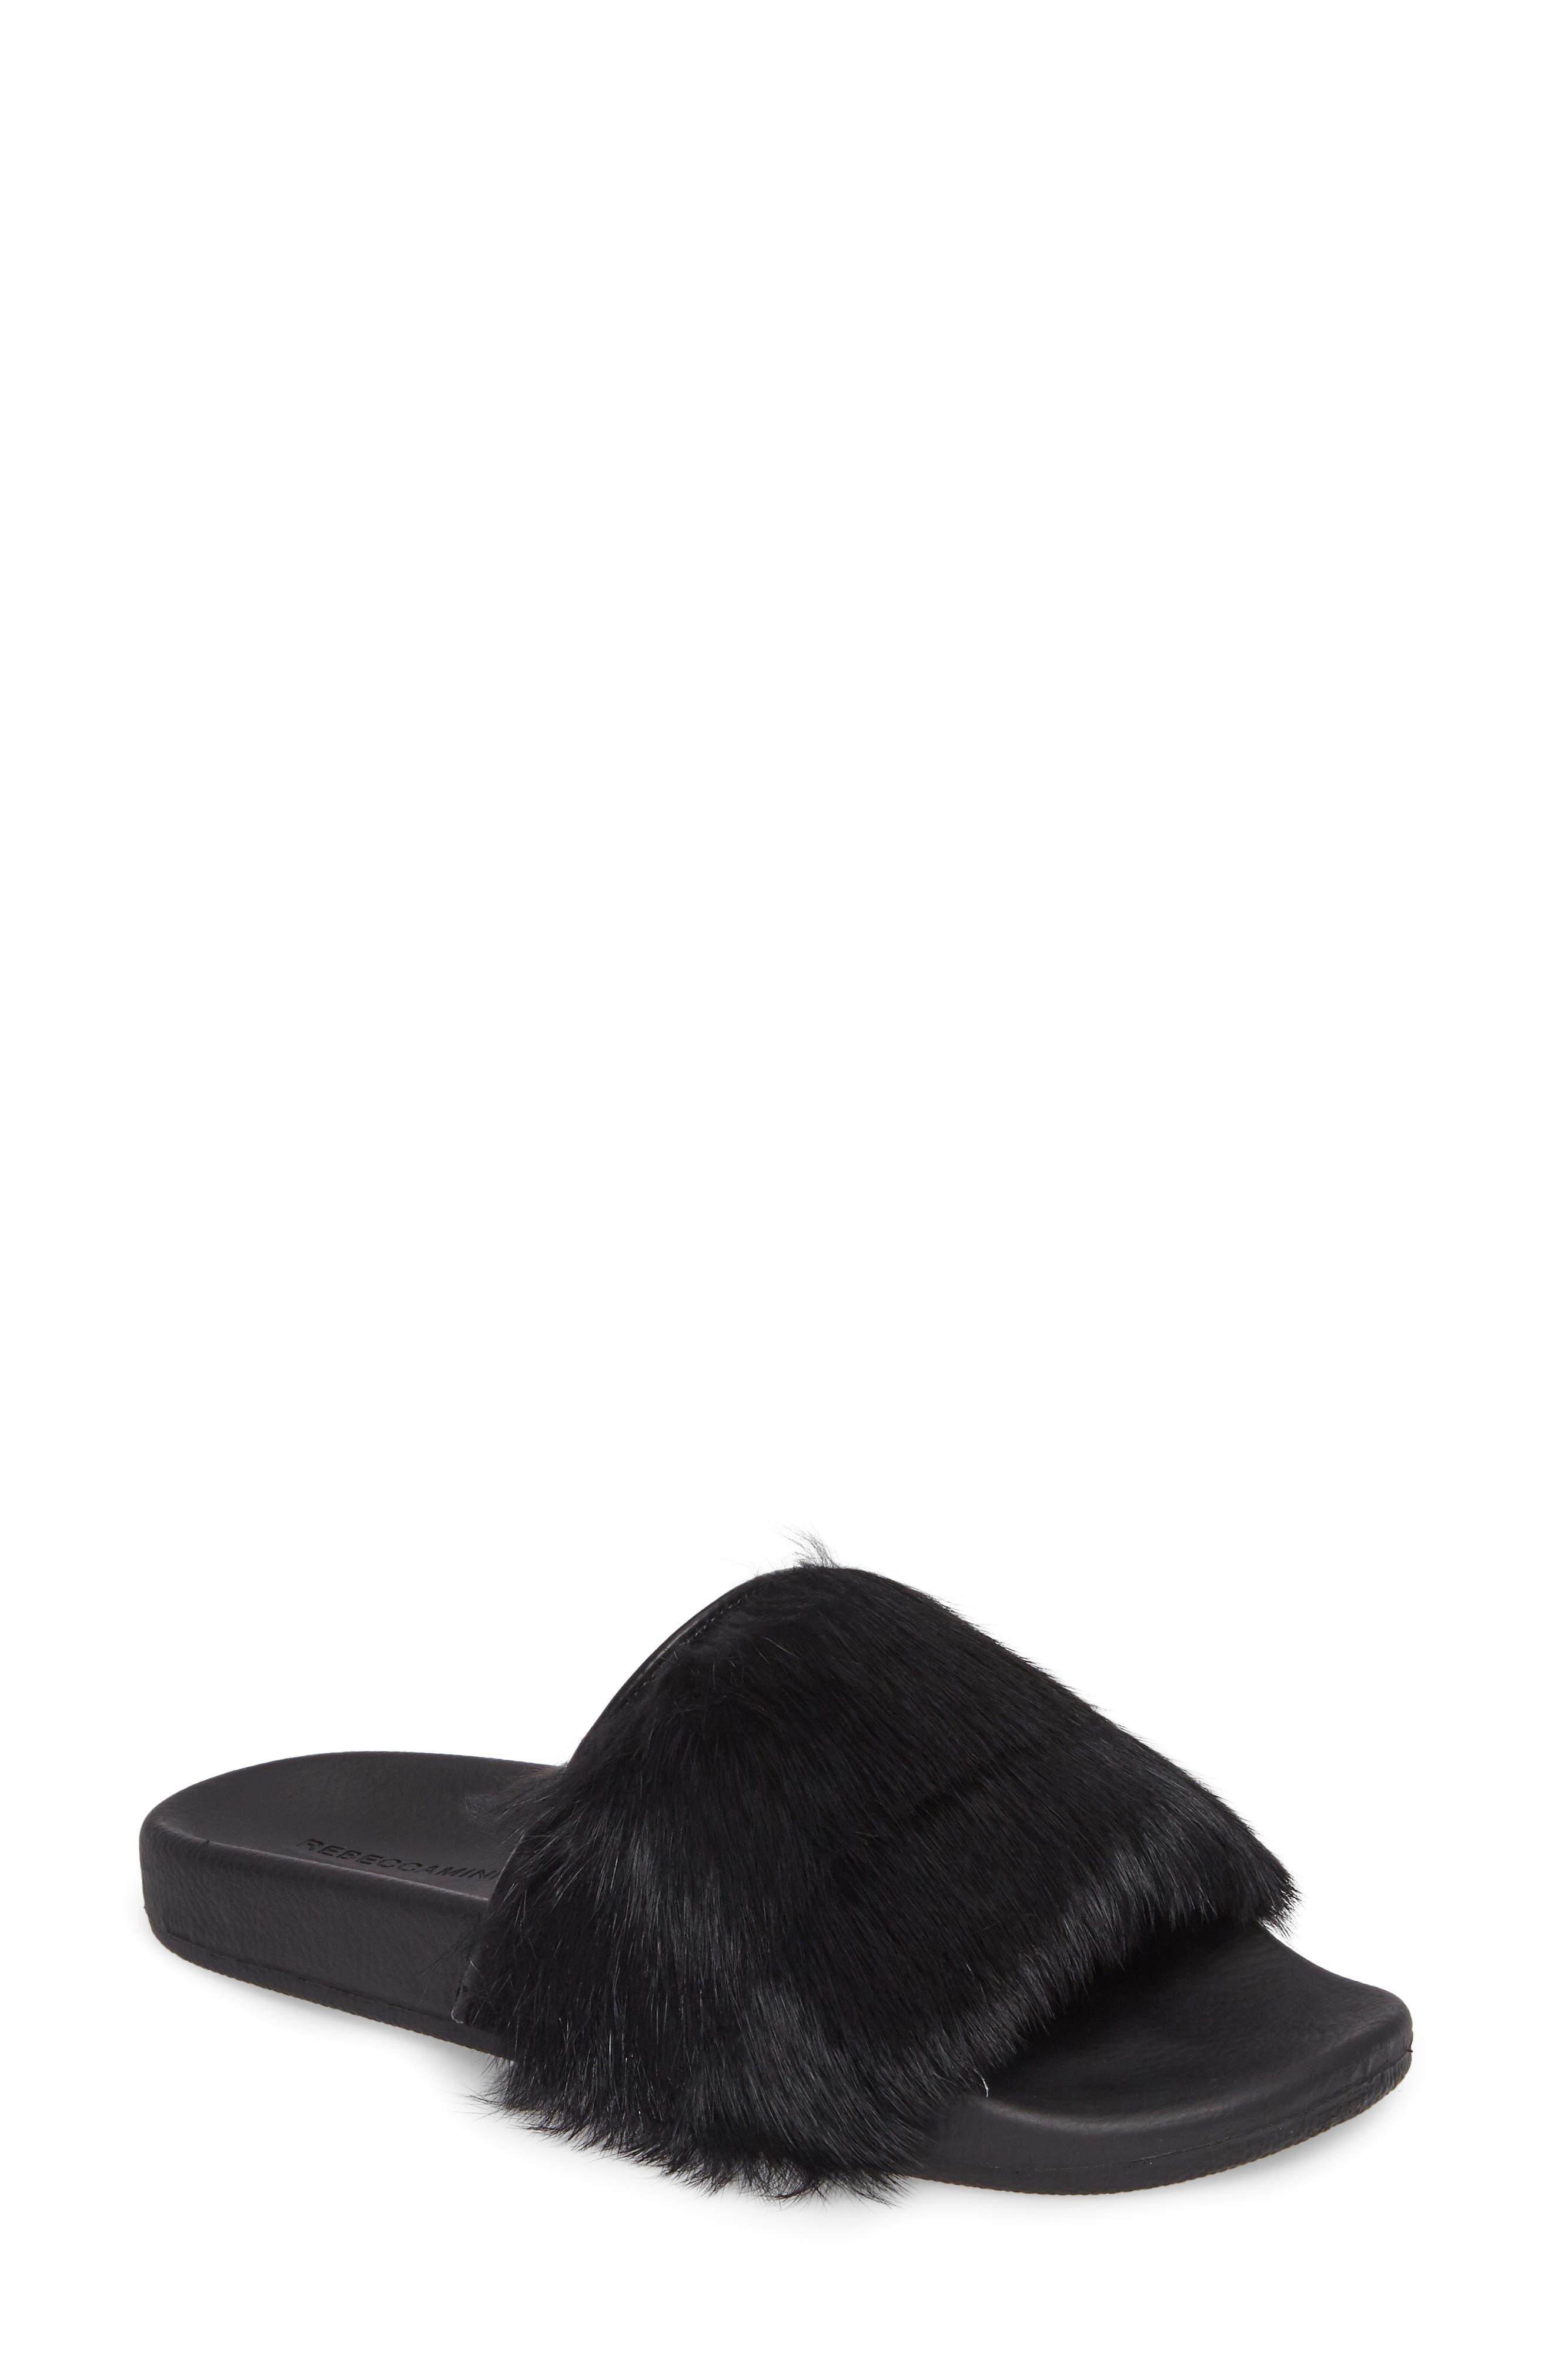 Sammi Genuine Fur Slide Sandal,                         Main,                         color, 001